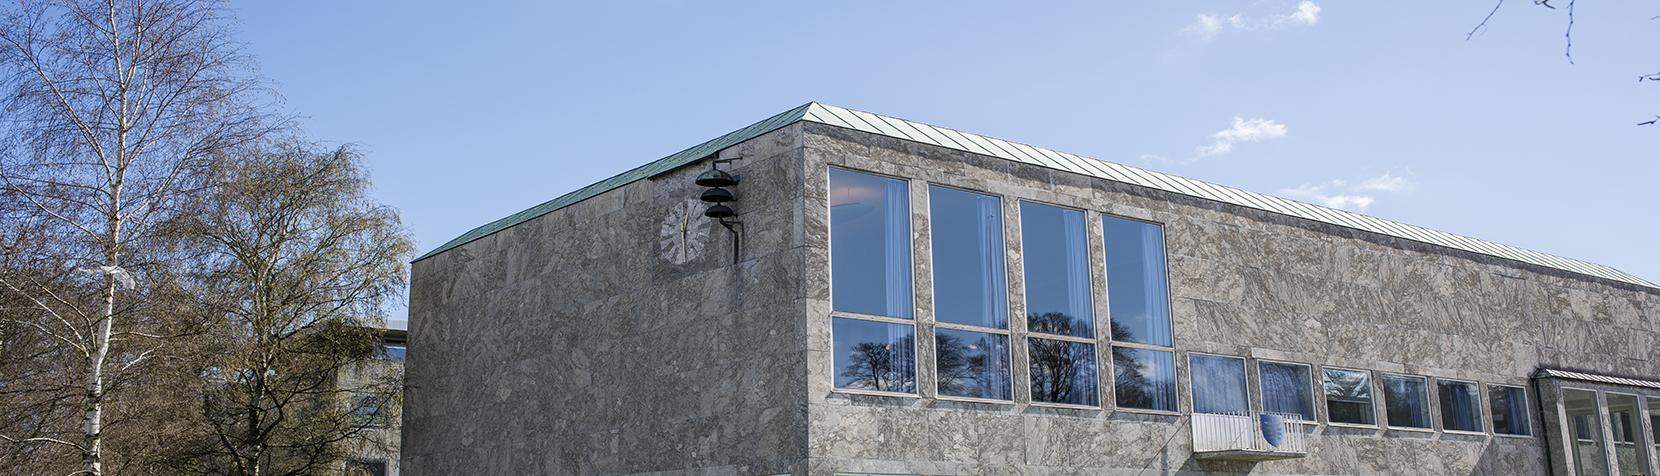 Rudersdal Rådhus